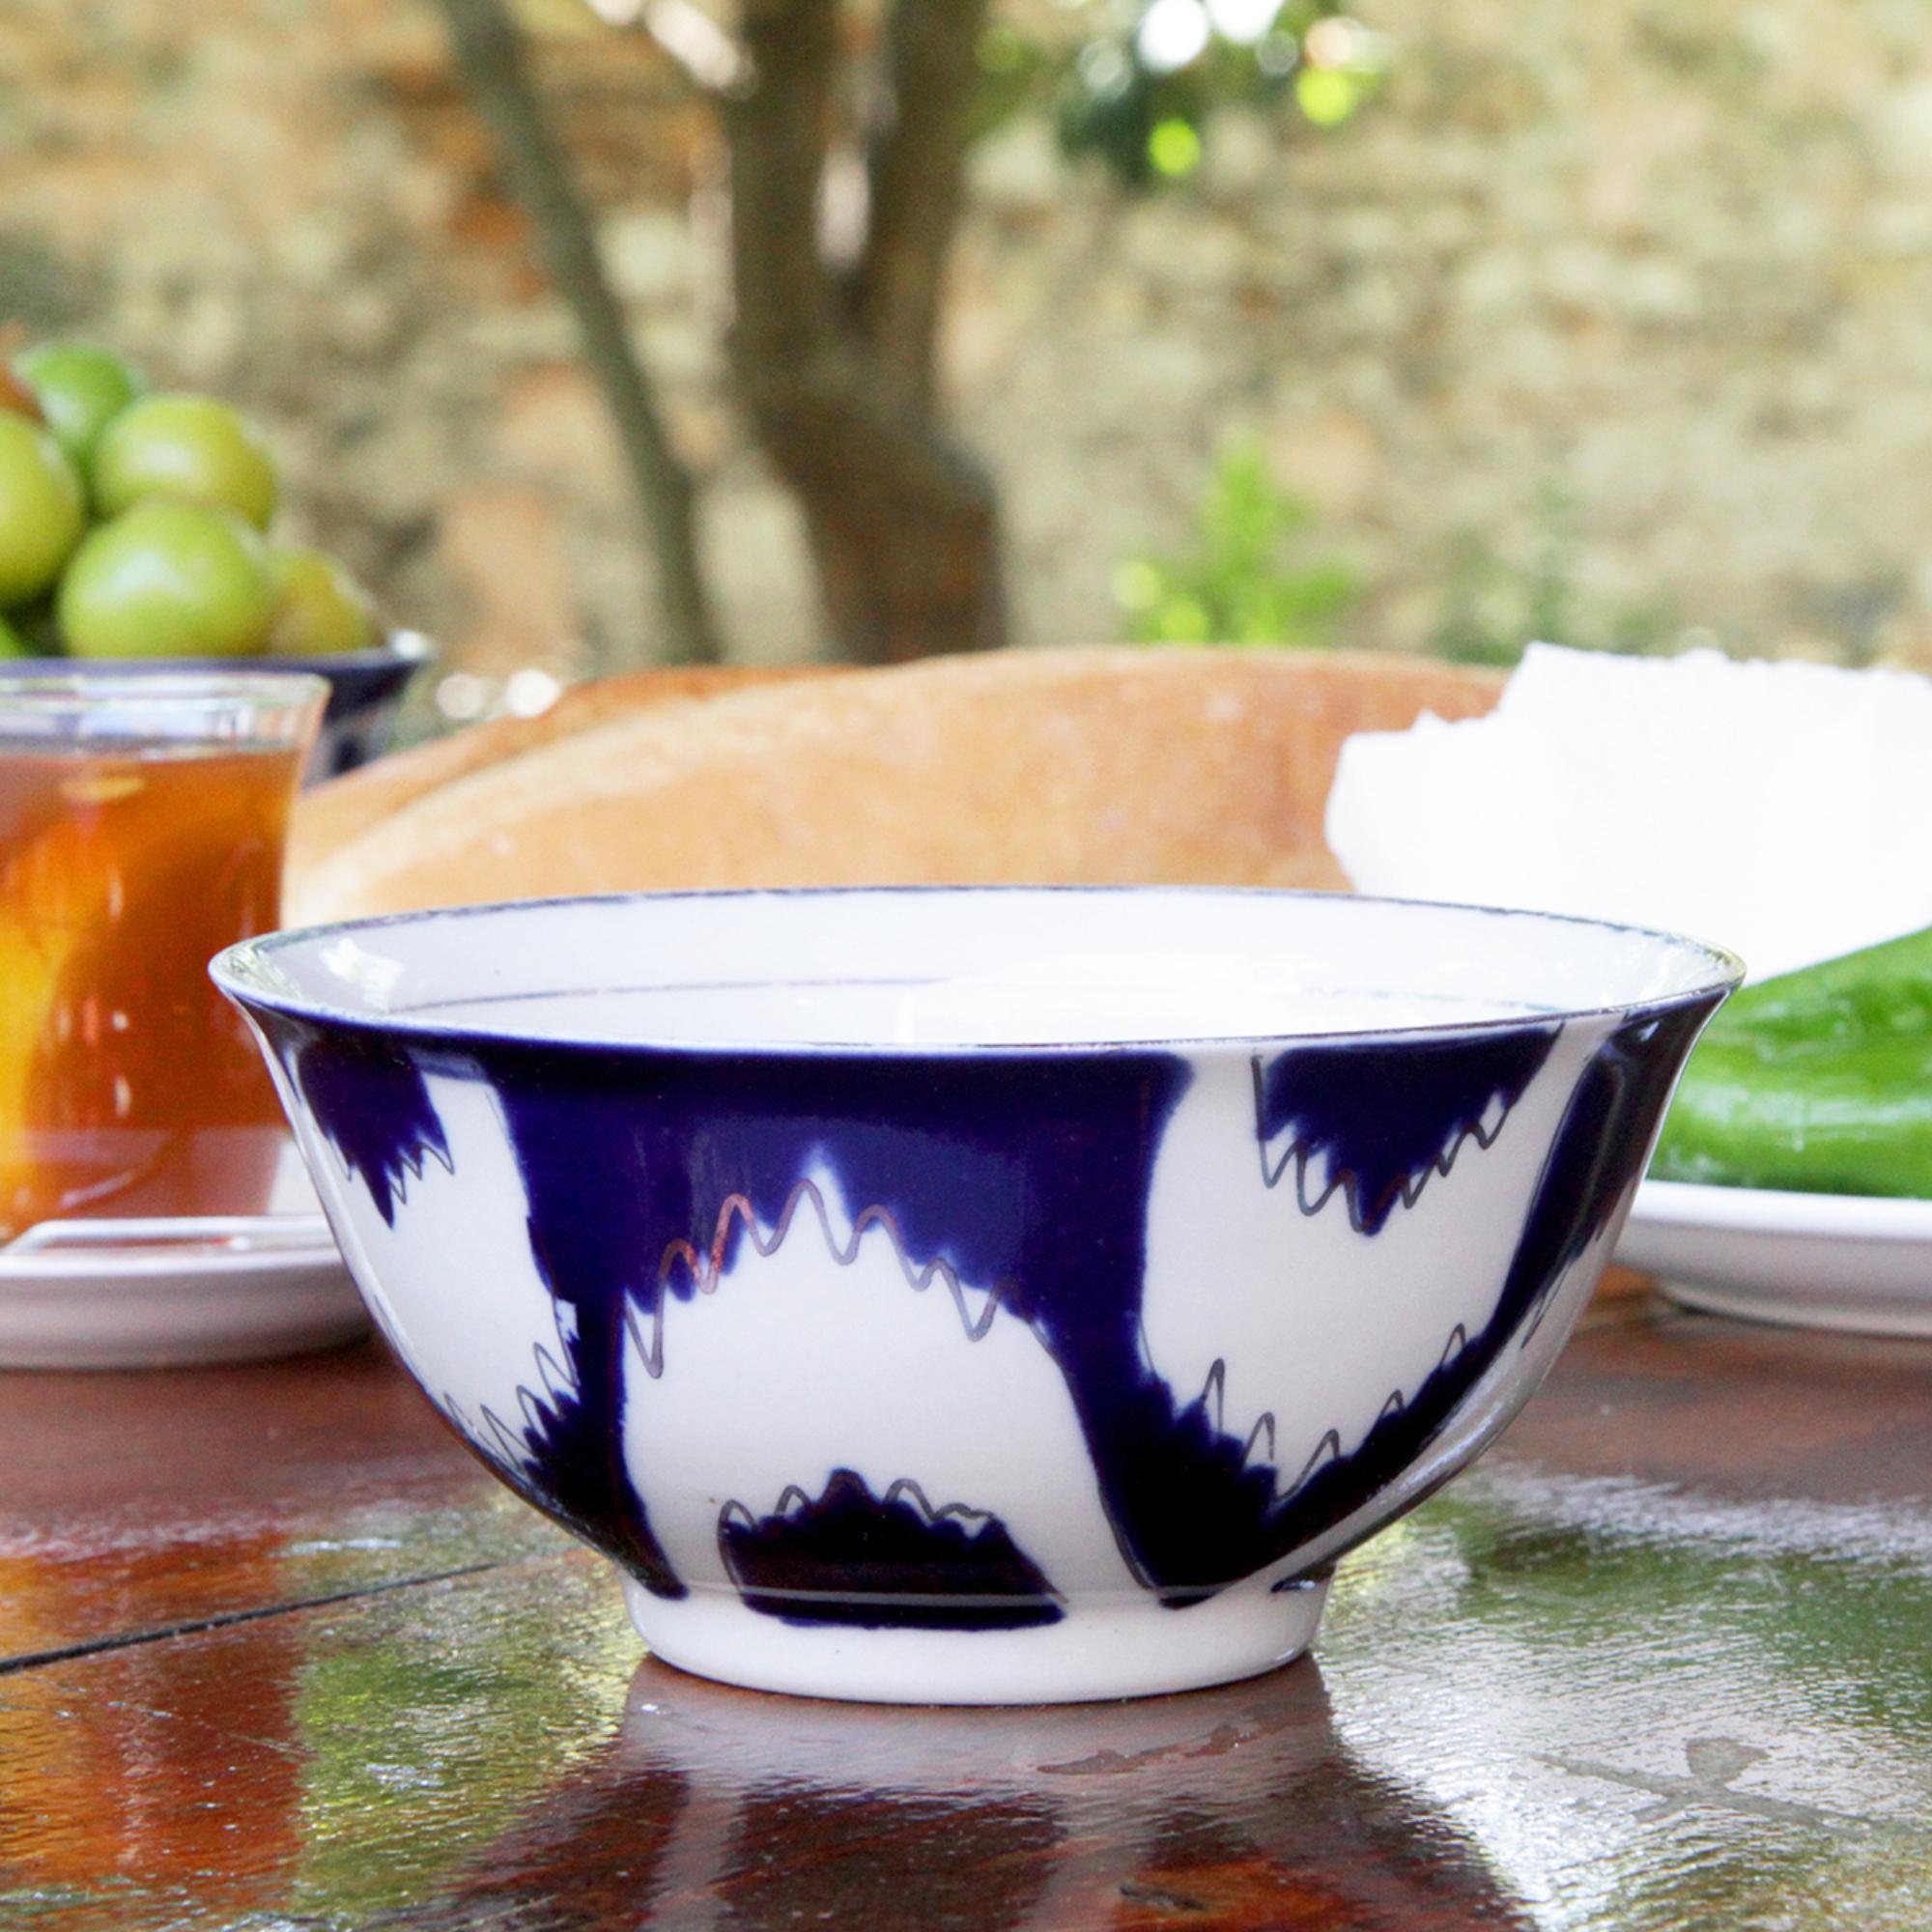 1501-NVY-Vintage-Uzbek-Bowl